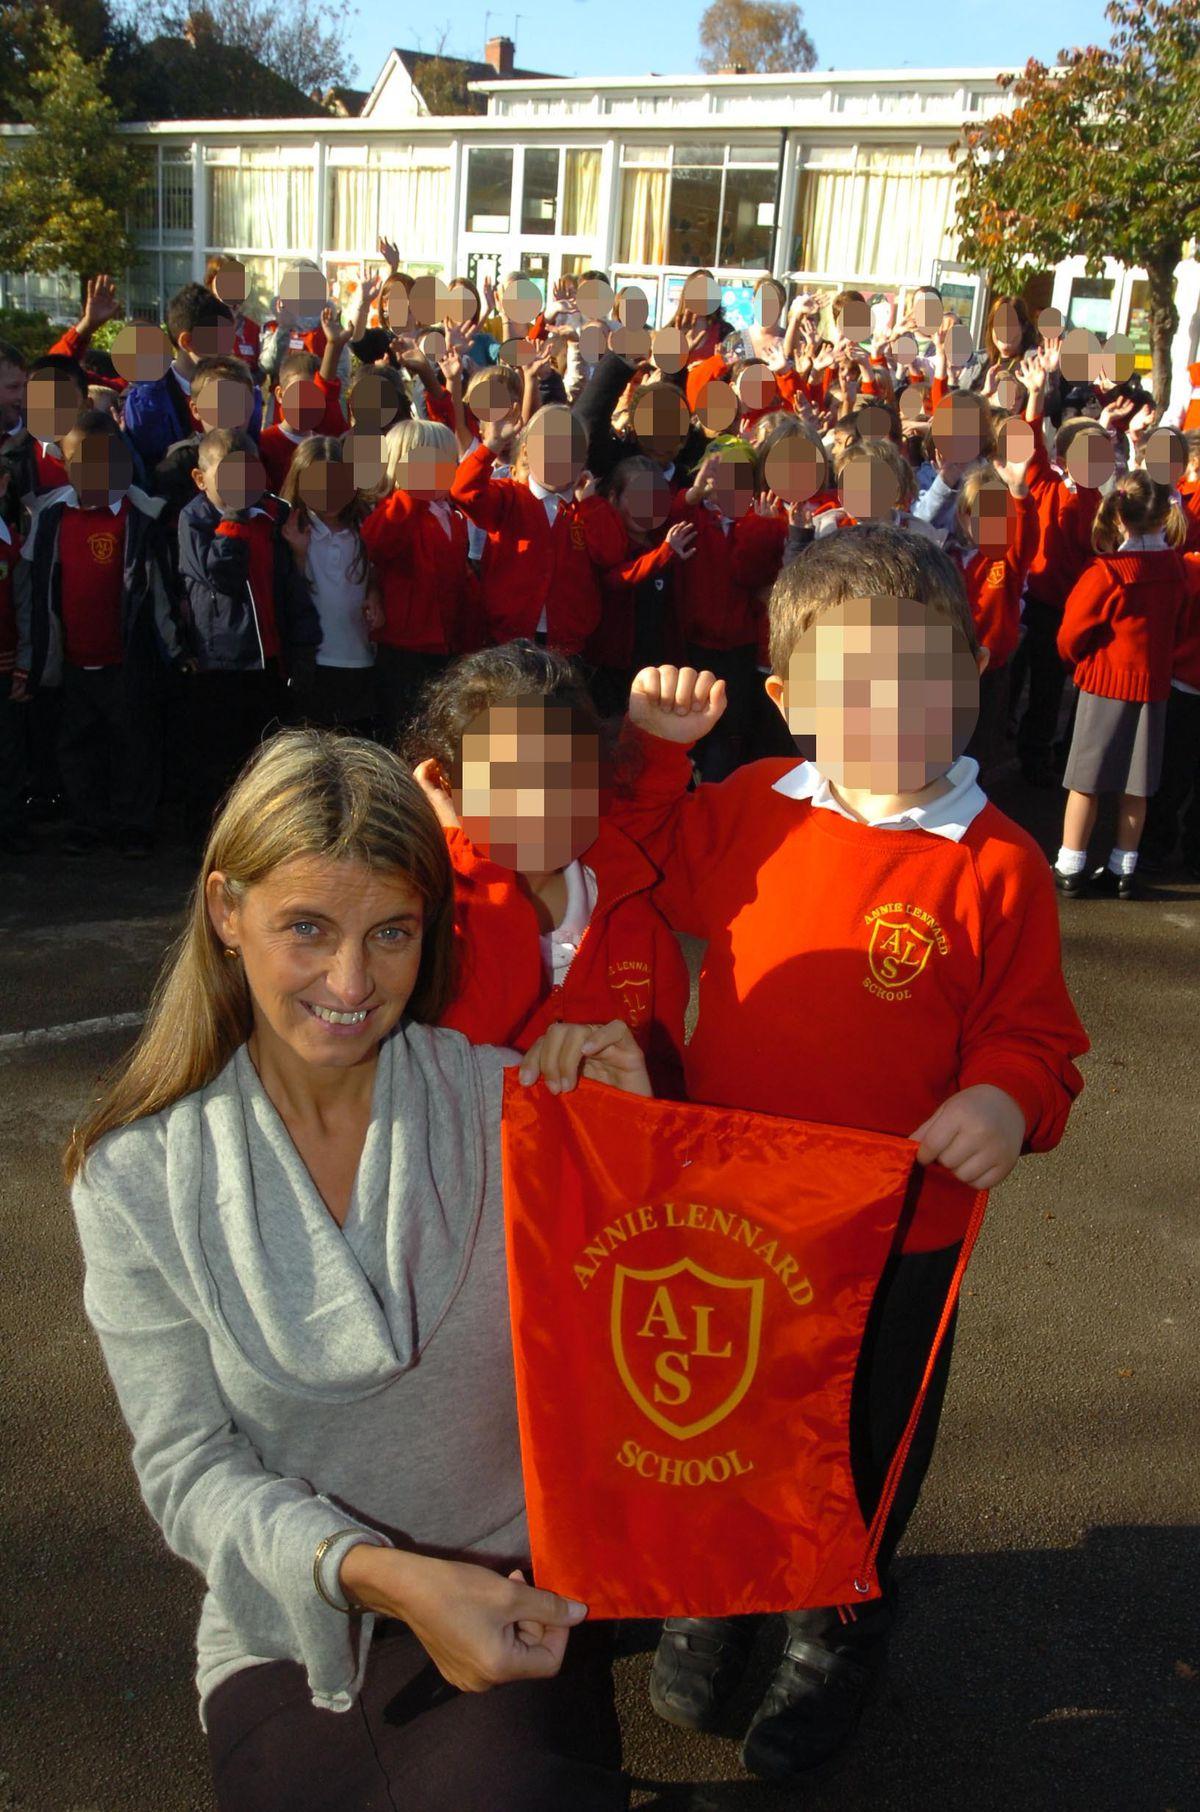 Ex-headteacher Michelle Hollingsworth pictured at Annie Lennard School in November 2007